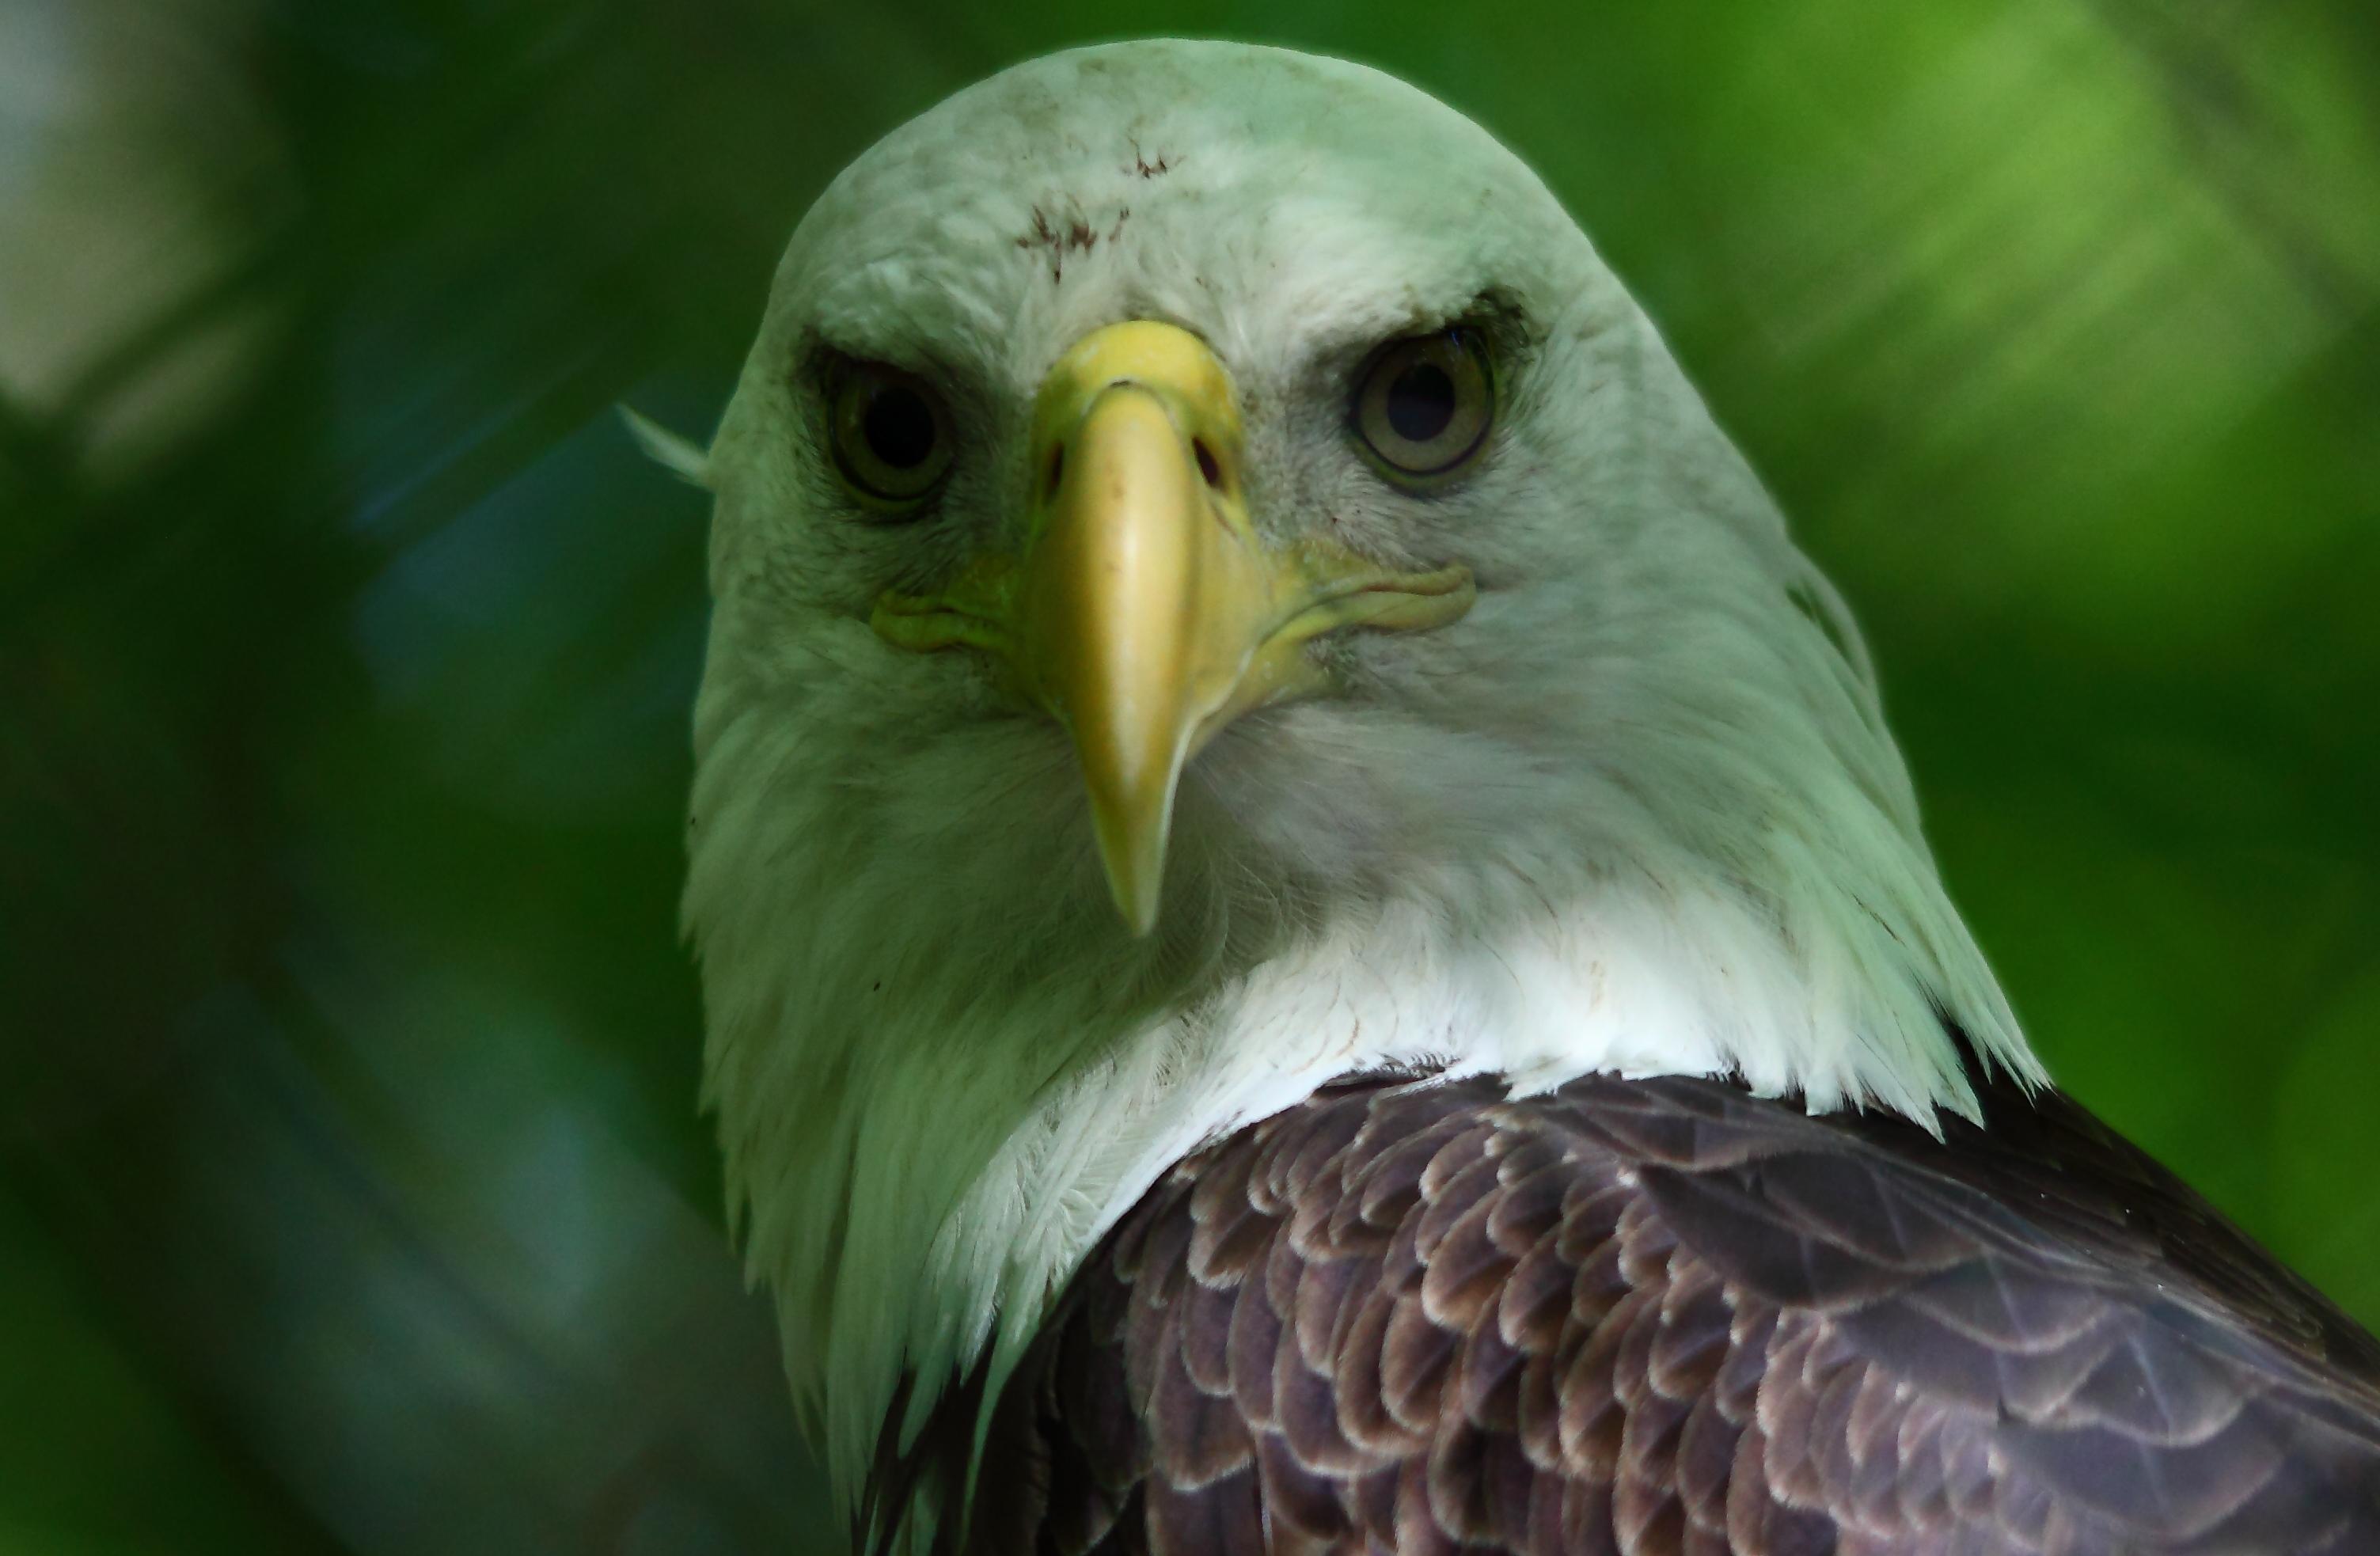 Description Bald-eagle-wildlife 23 - West Virginia - ForestWander.jpg